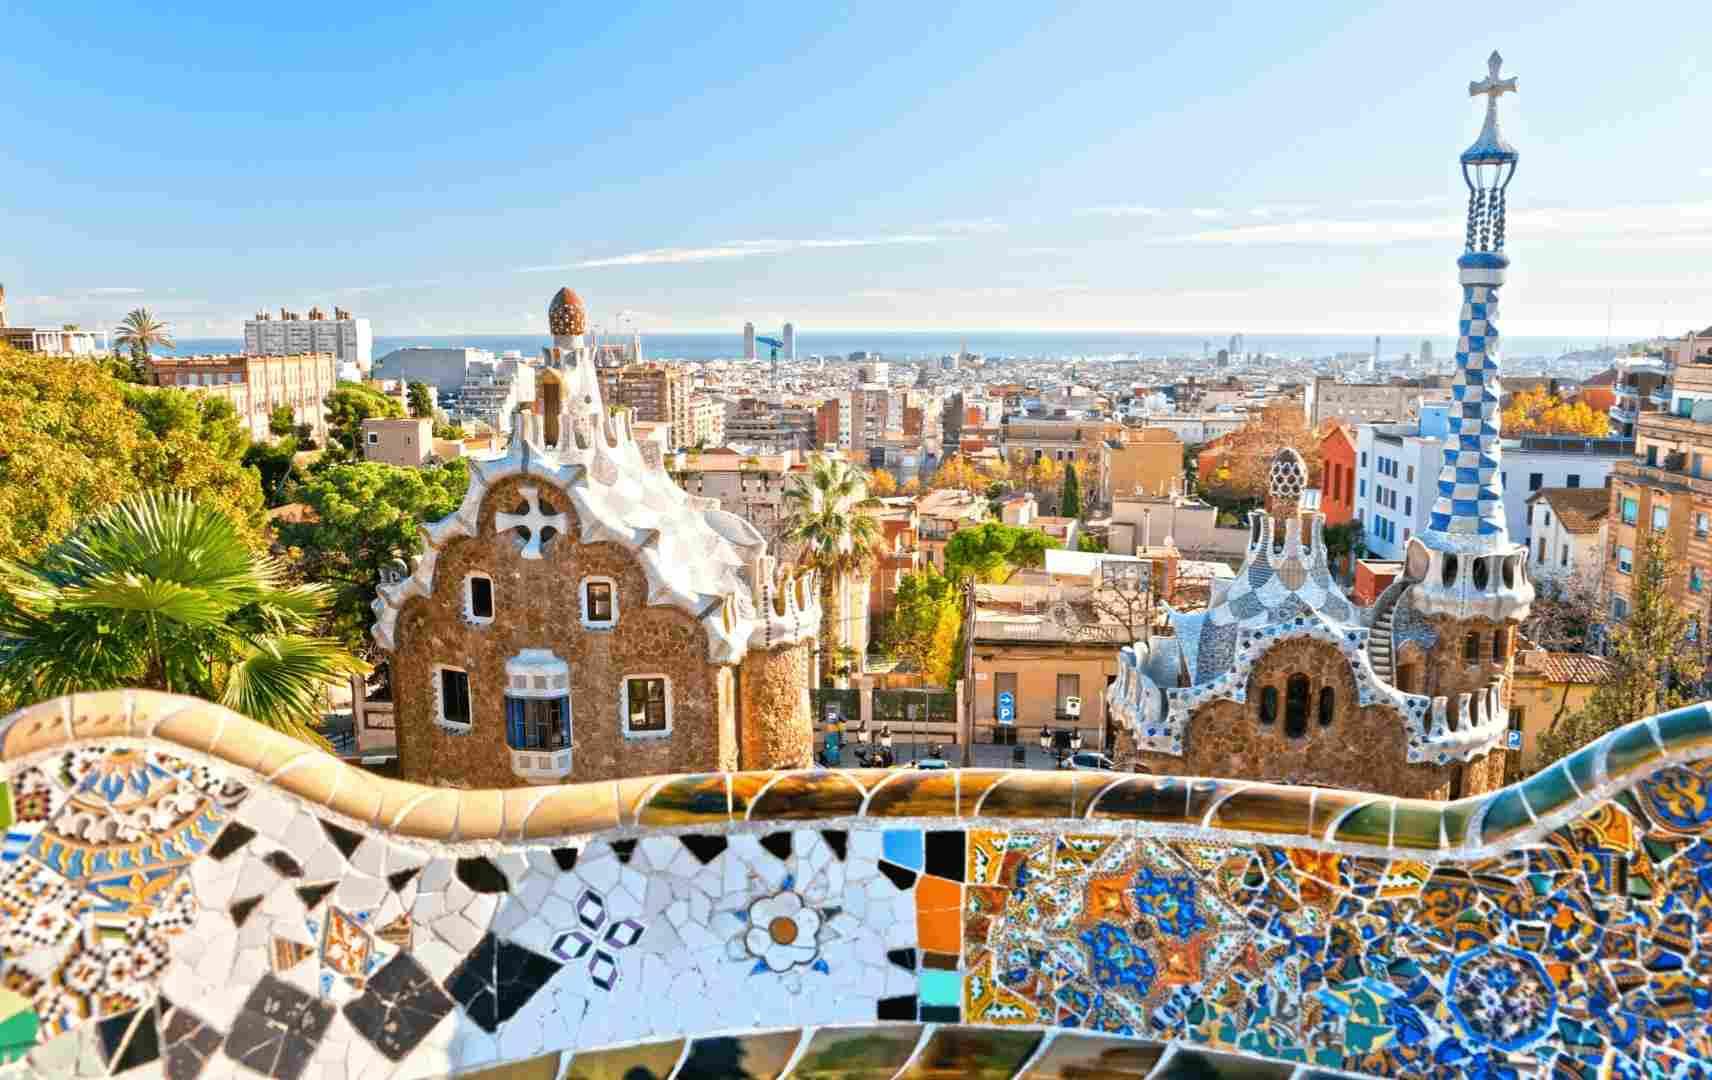 Bunte Häuser Mosaik